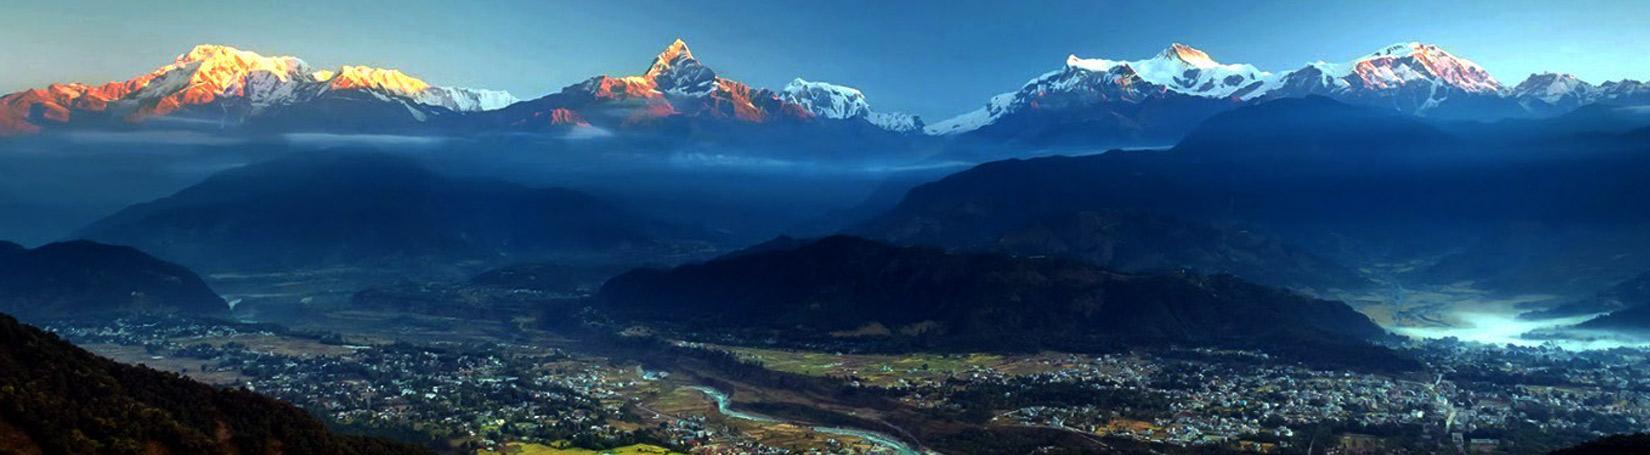 Annapurna Range and Pokhara City